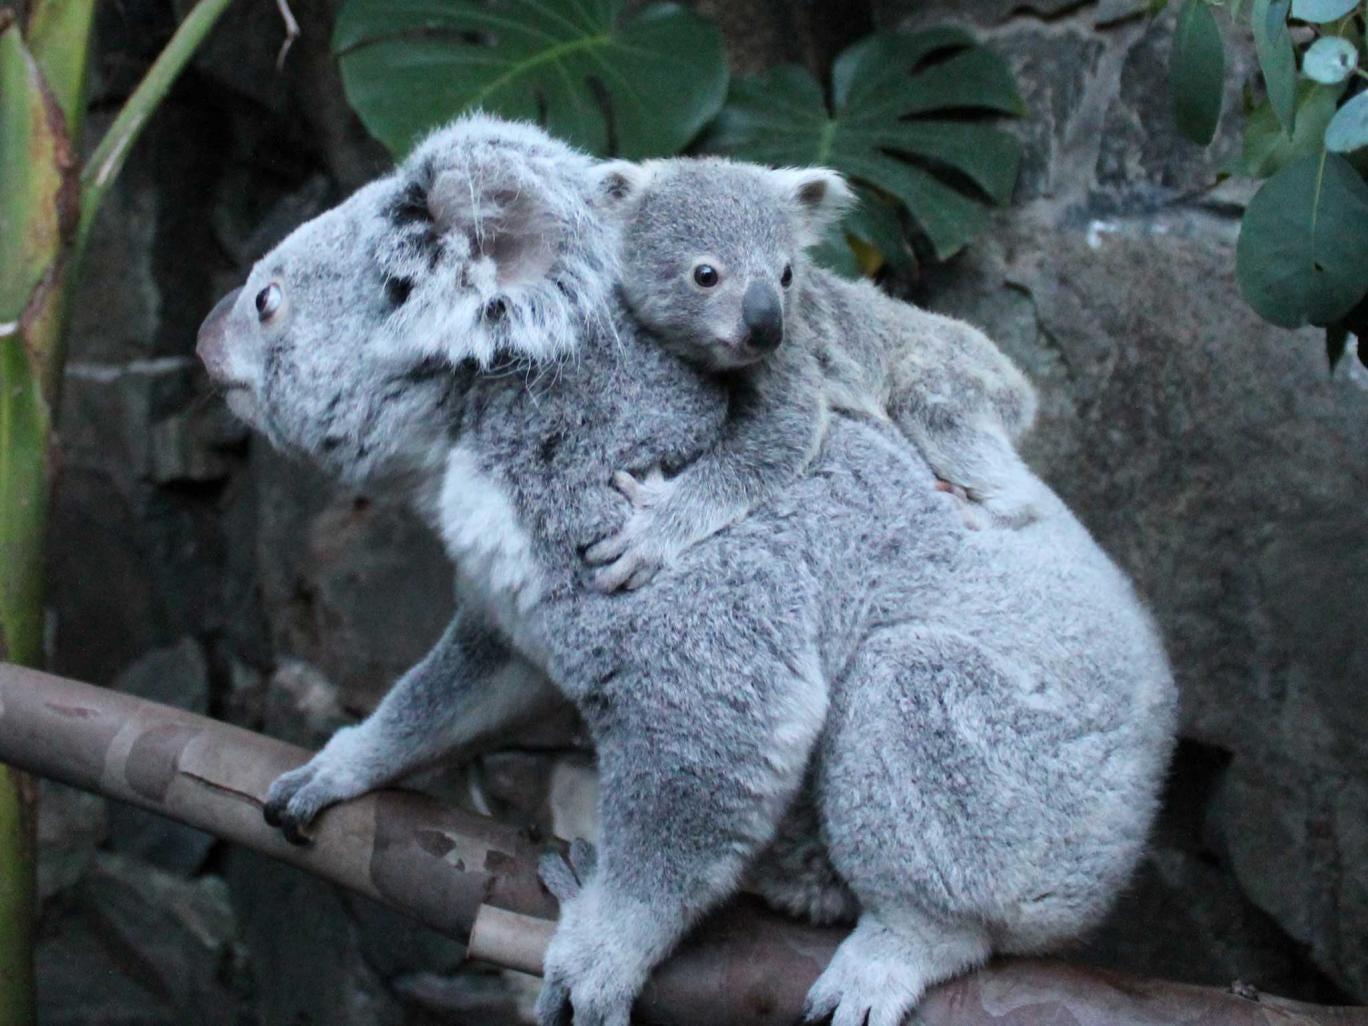 Yooranah with his mother Alinga at Edinburgh Zoo